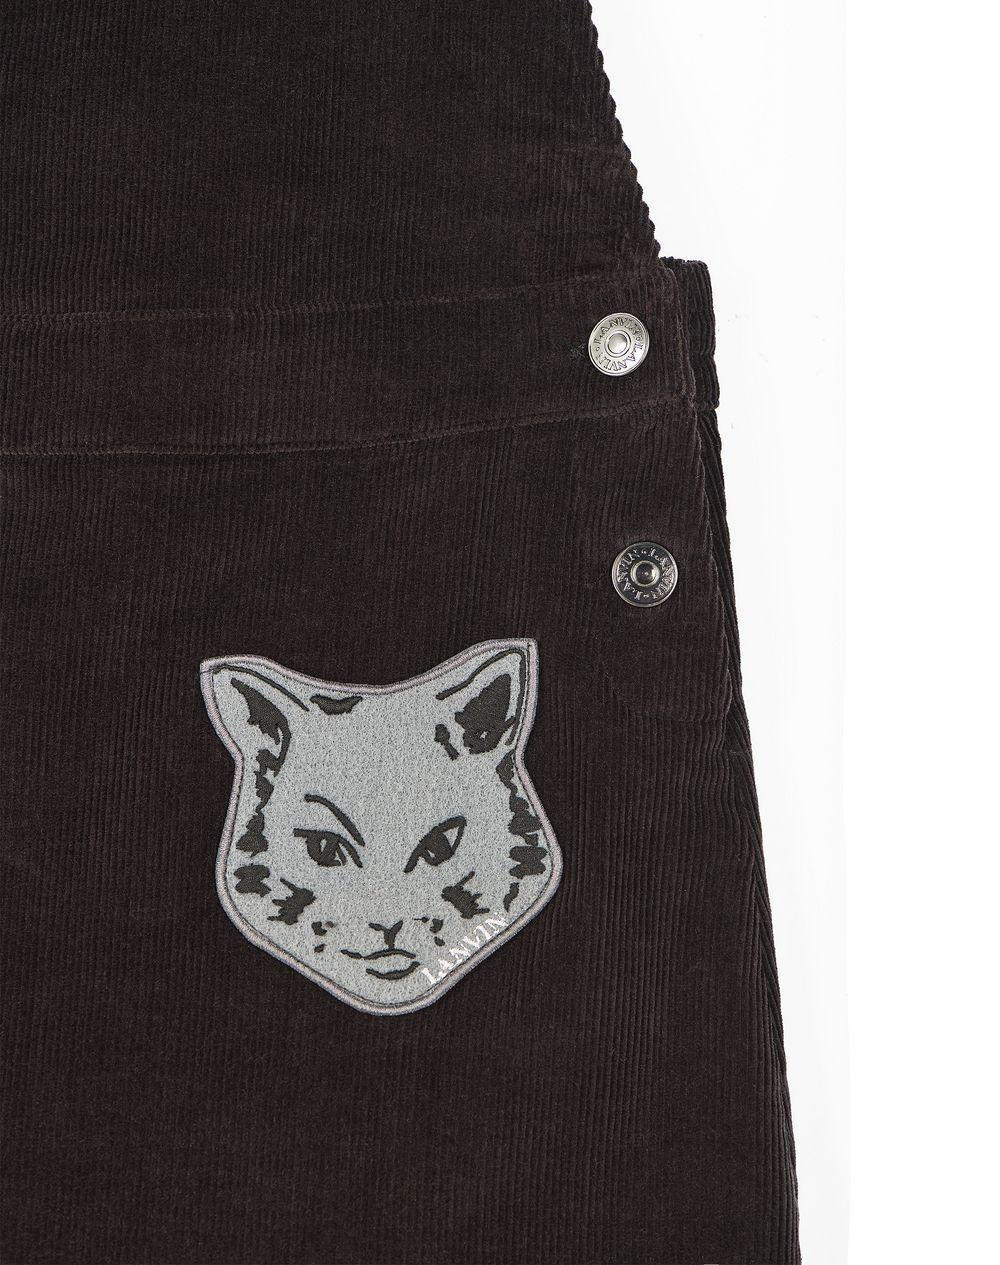 CAT PATCH OVERALLS - Lanvin